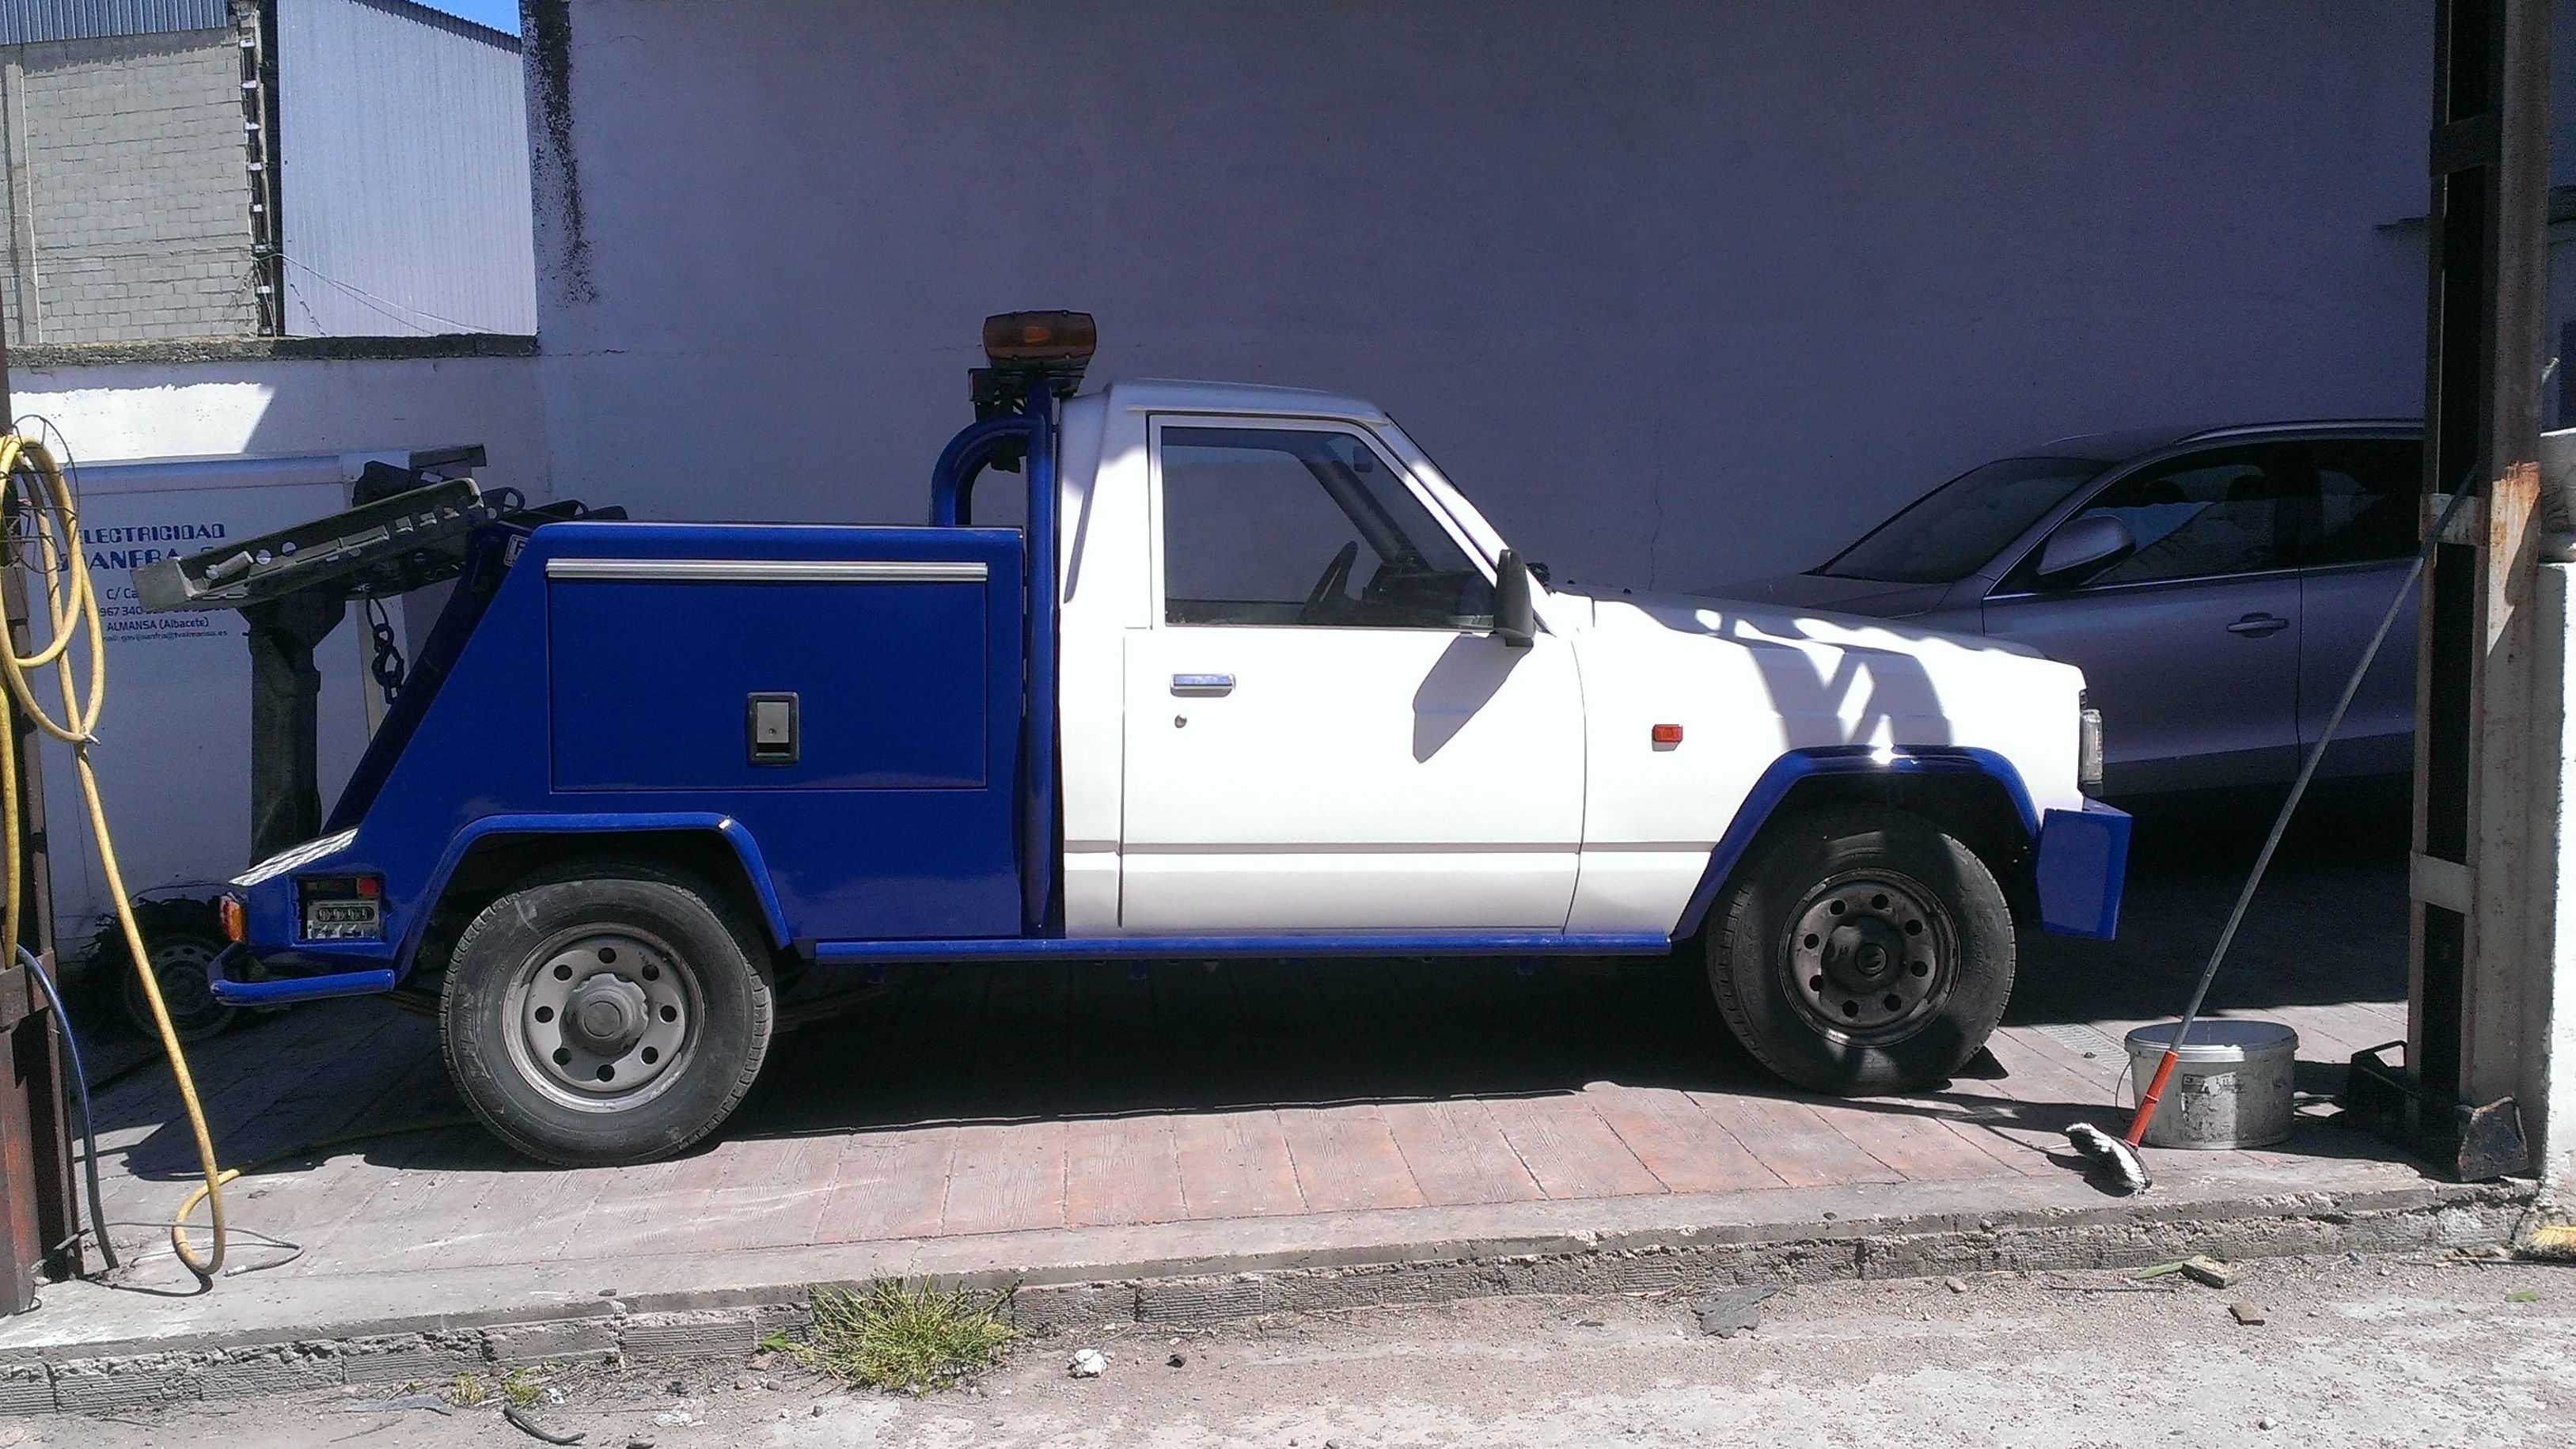 Foto 7 de Grúas para vehículos en Pedrola | Grúas J. Murillo